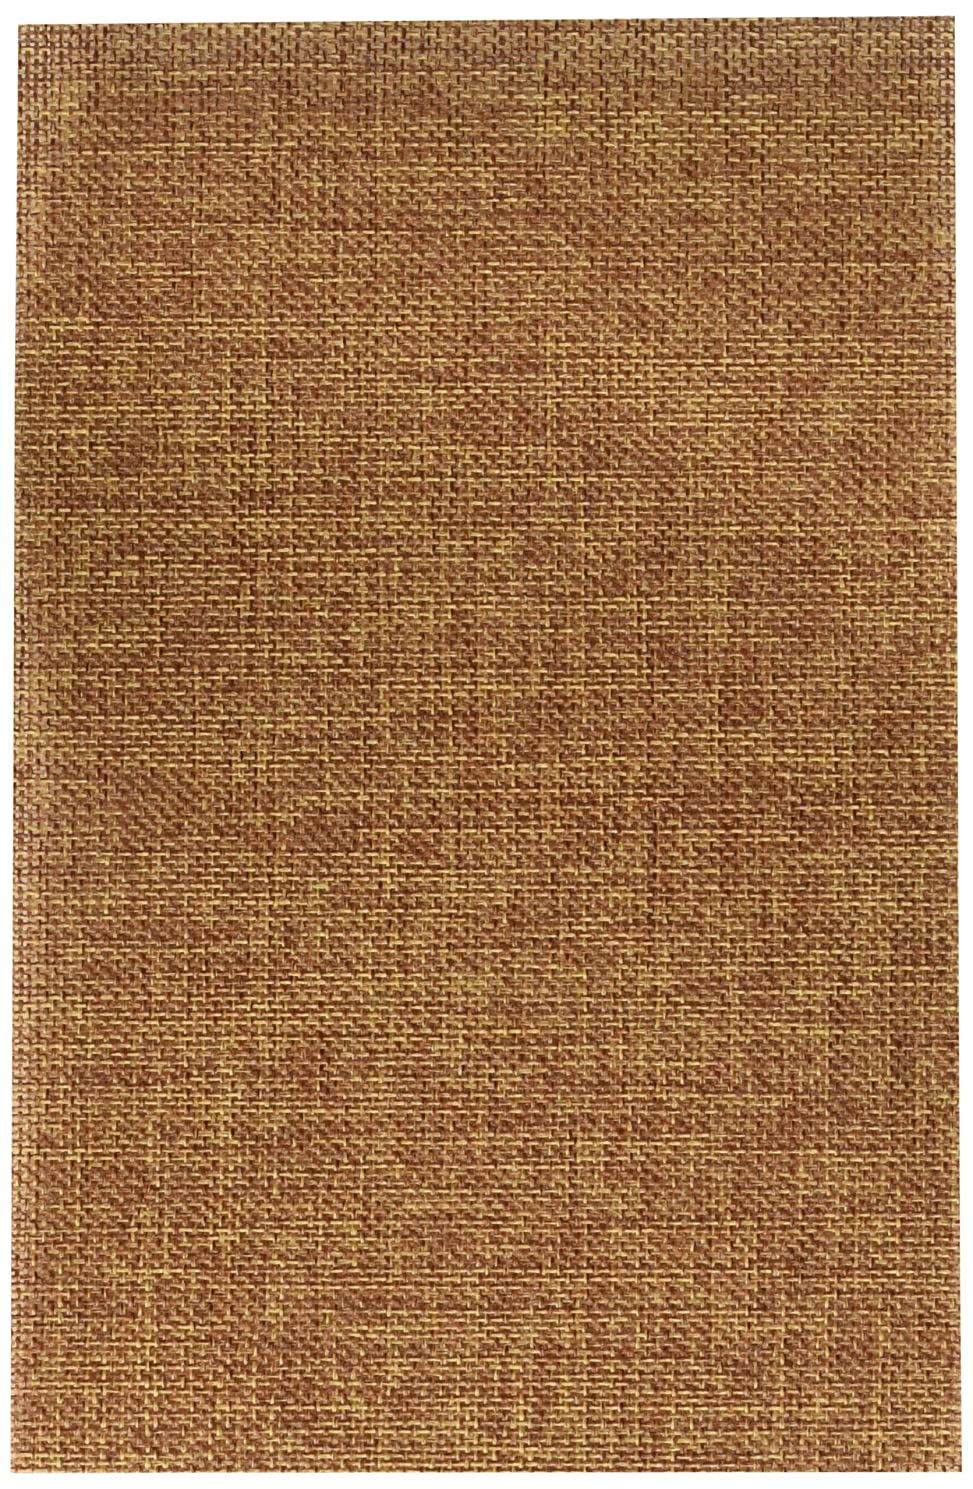 Gemini Craft Material Pack-Burlap Fabric Paper sheet-30 pk Mixed Media Surface, Brown